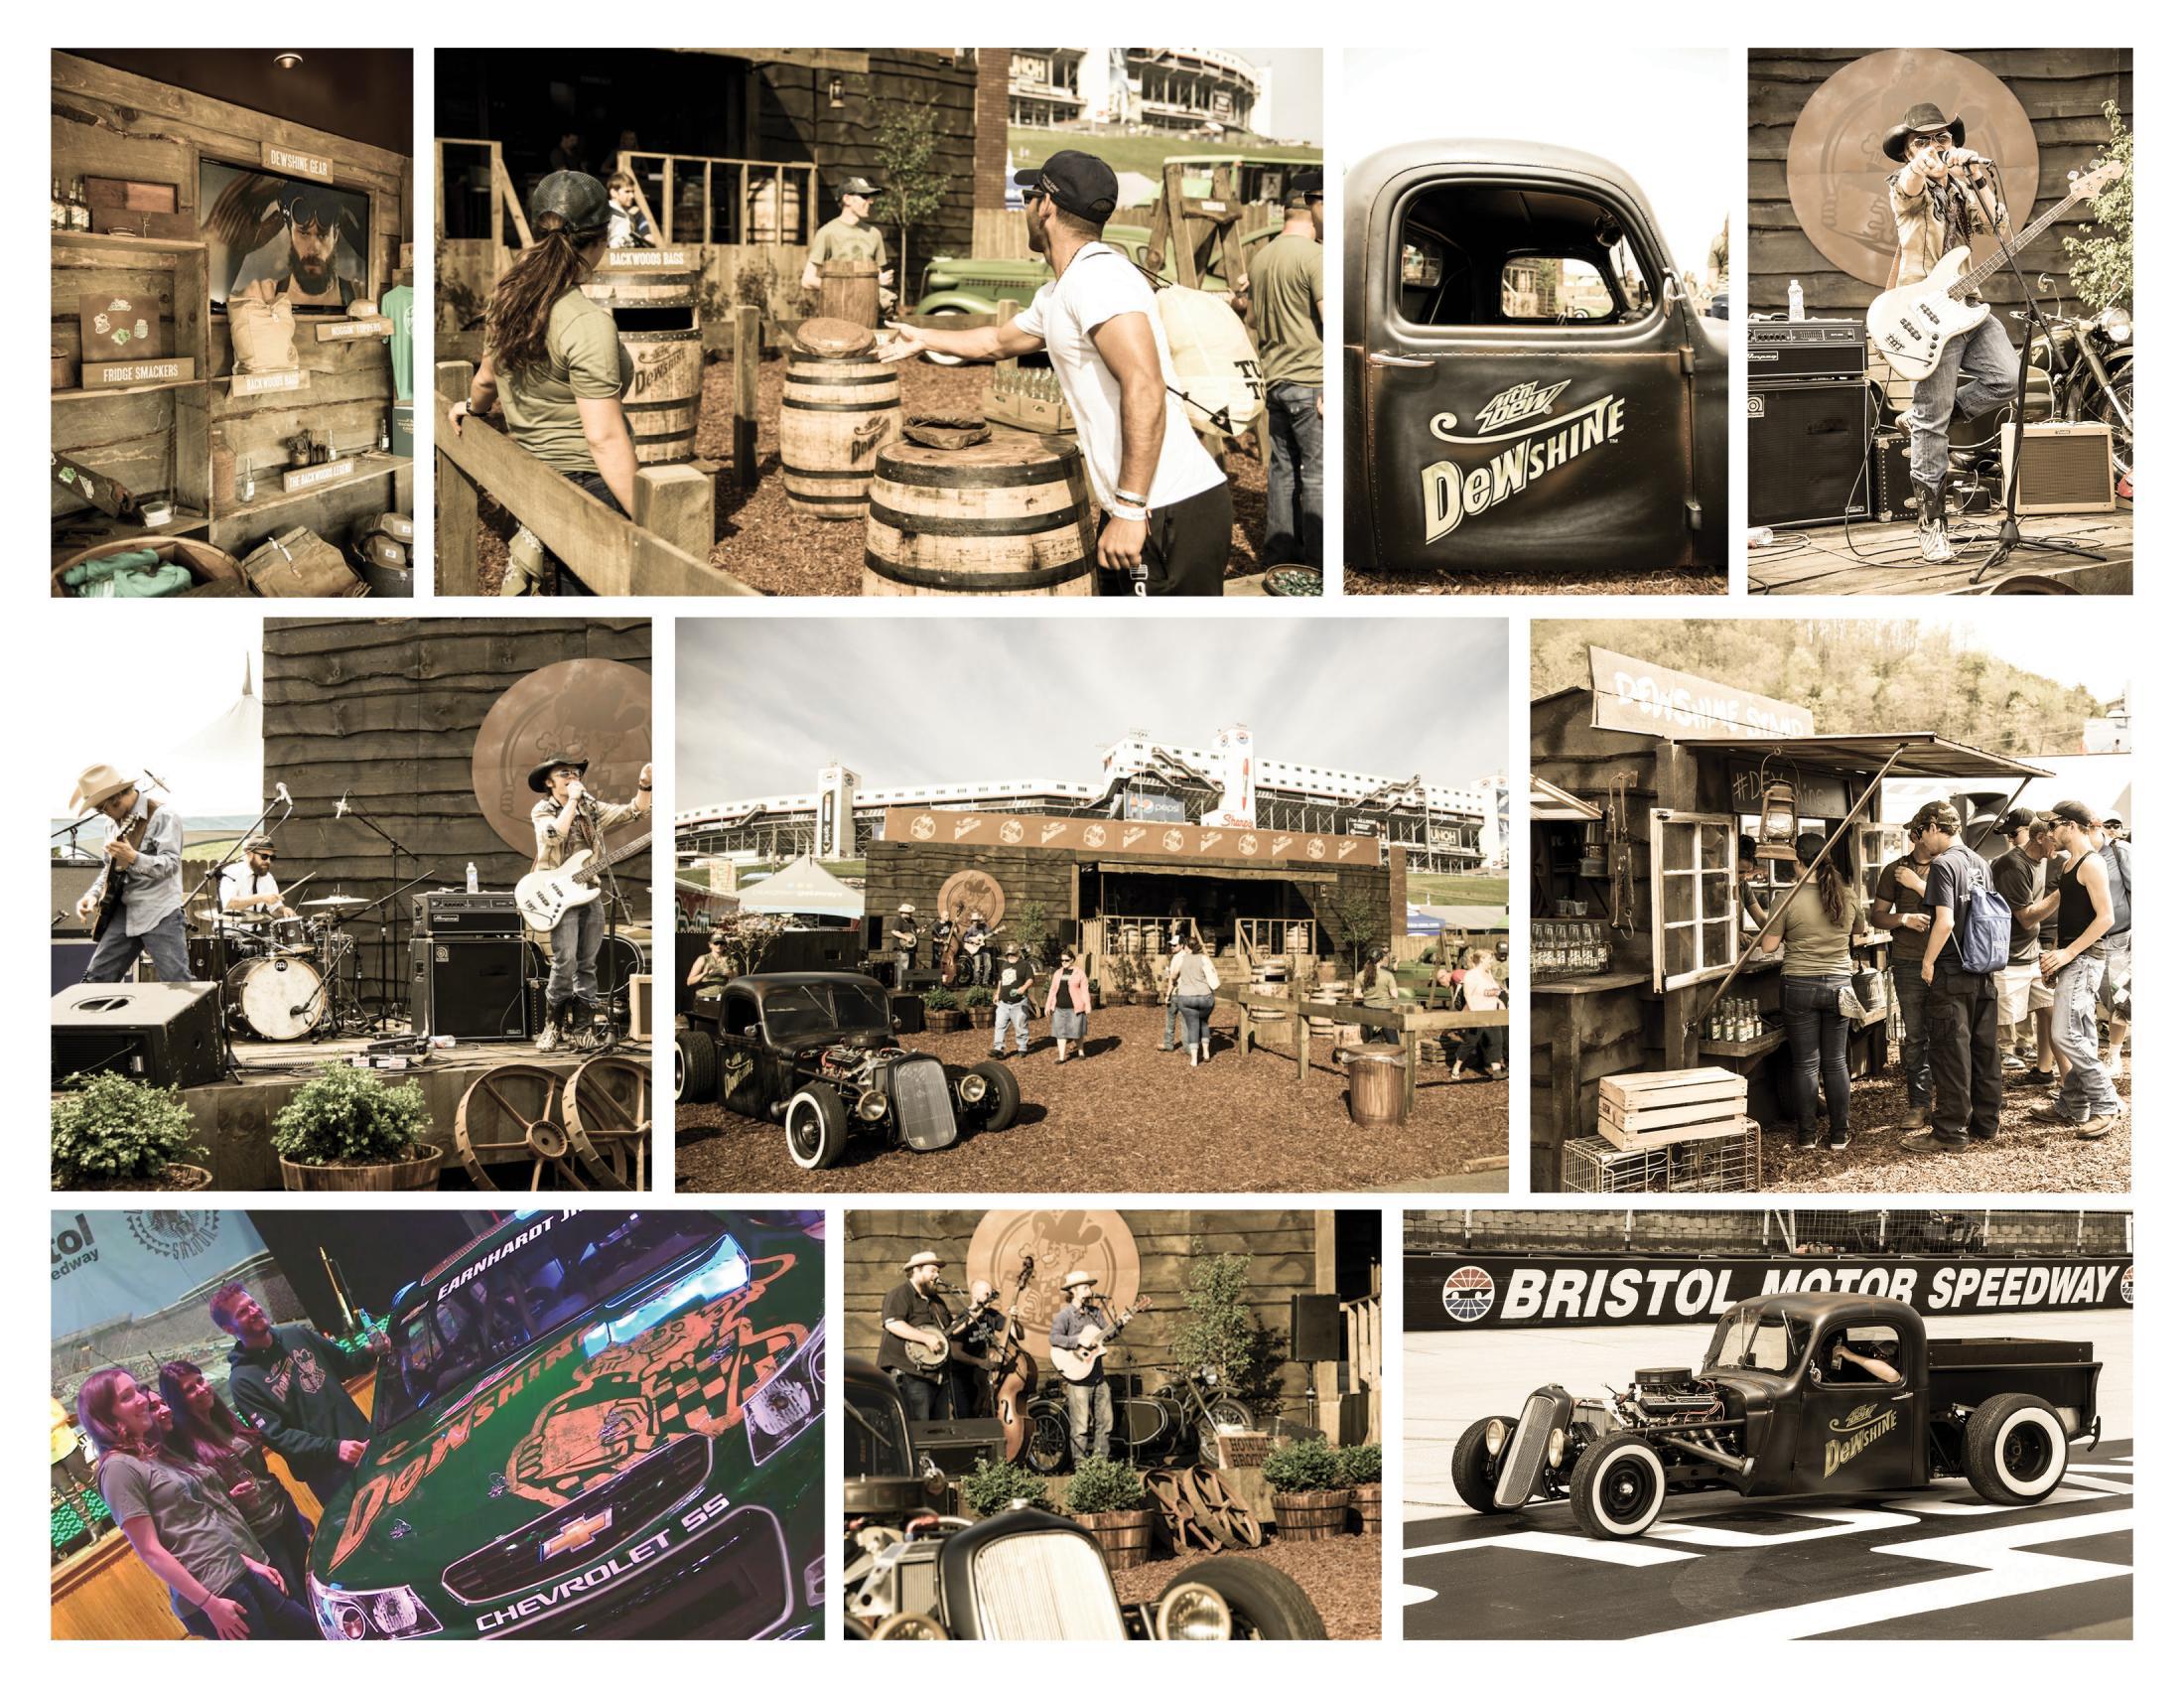 Thumbnail for DEWshine – Bristol Motor Speedway Activation